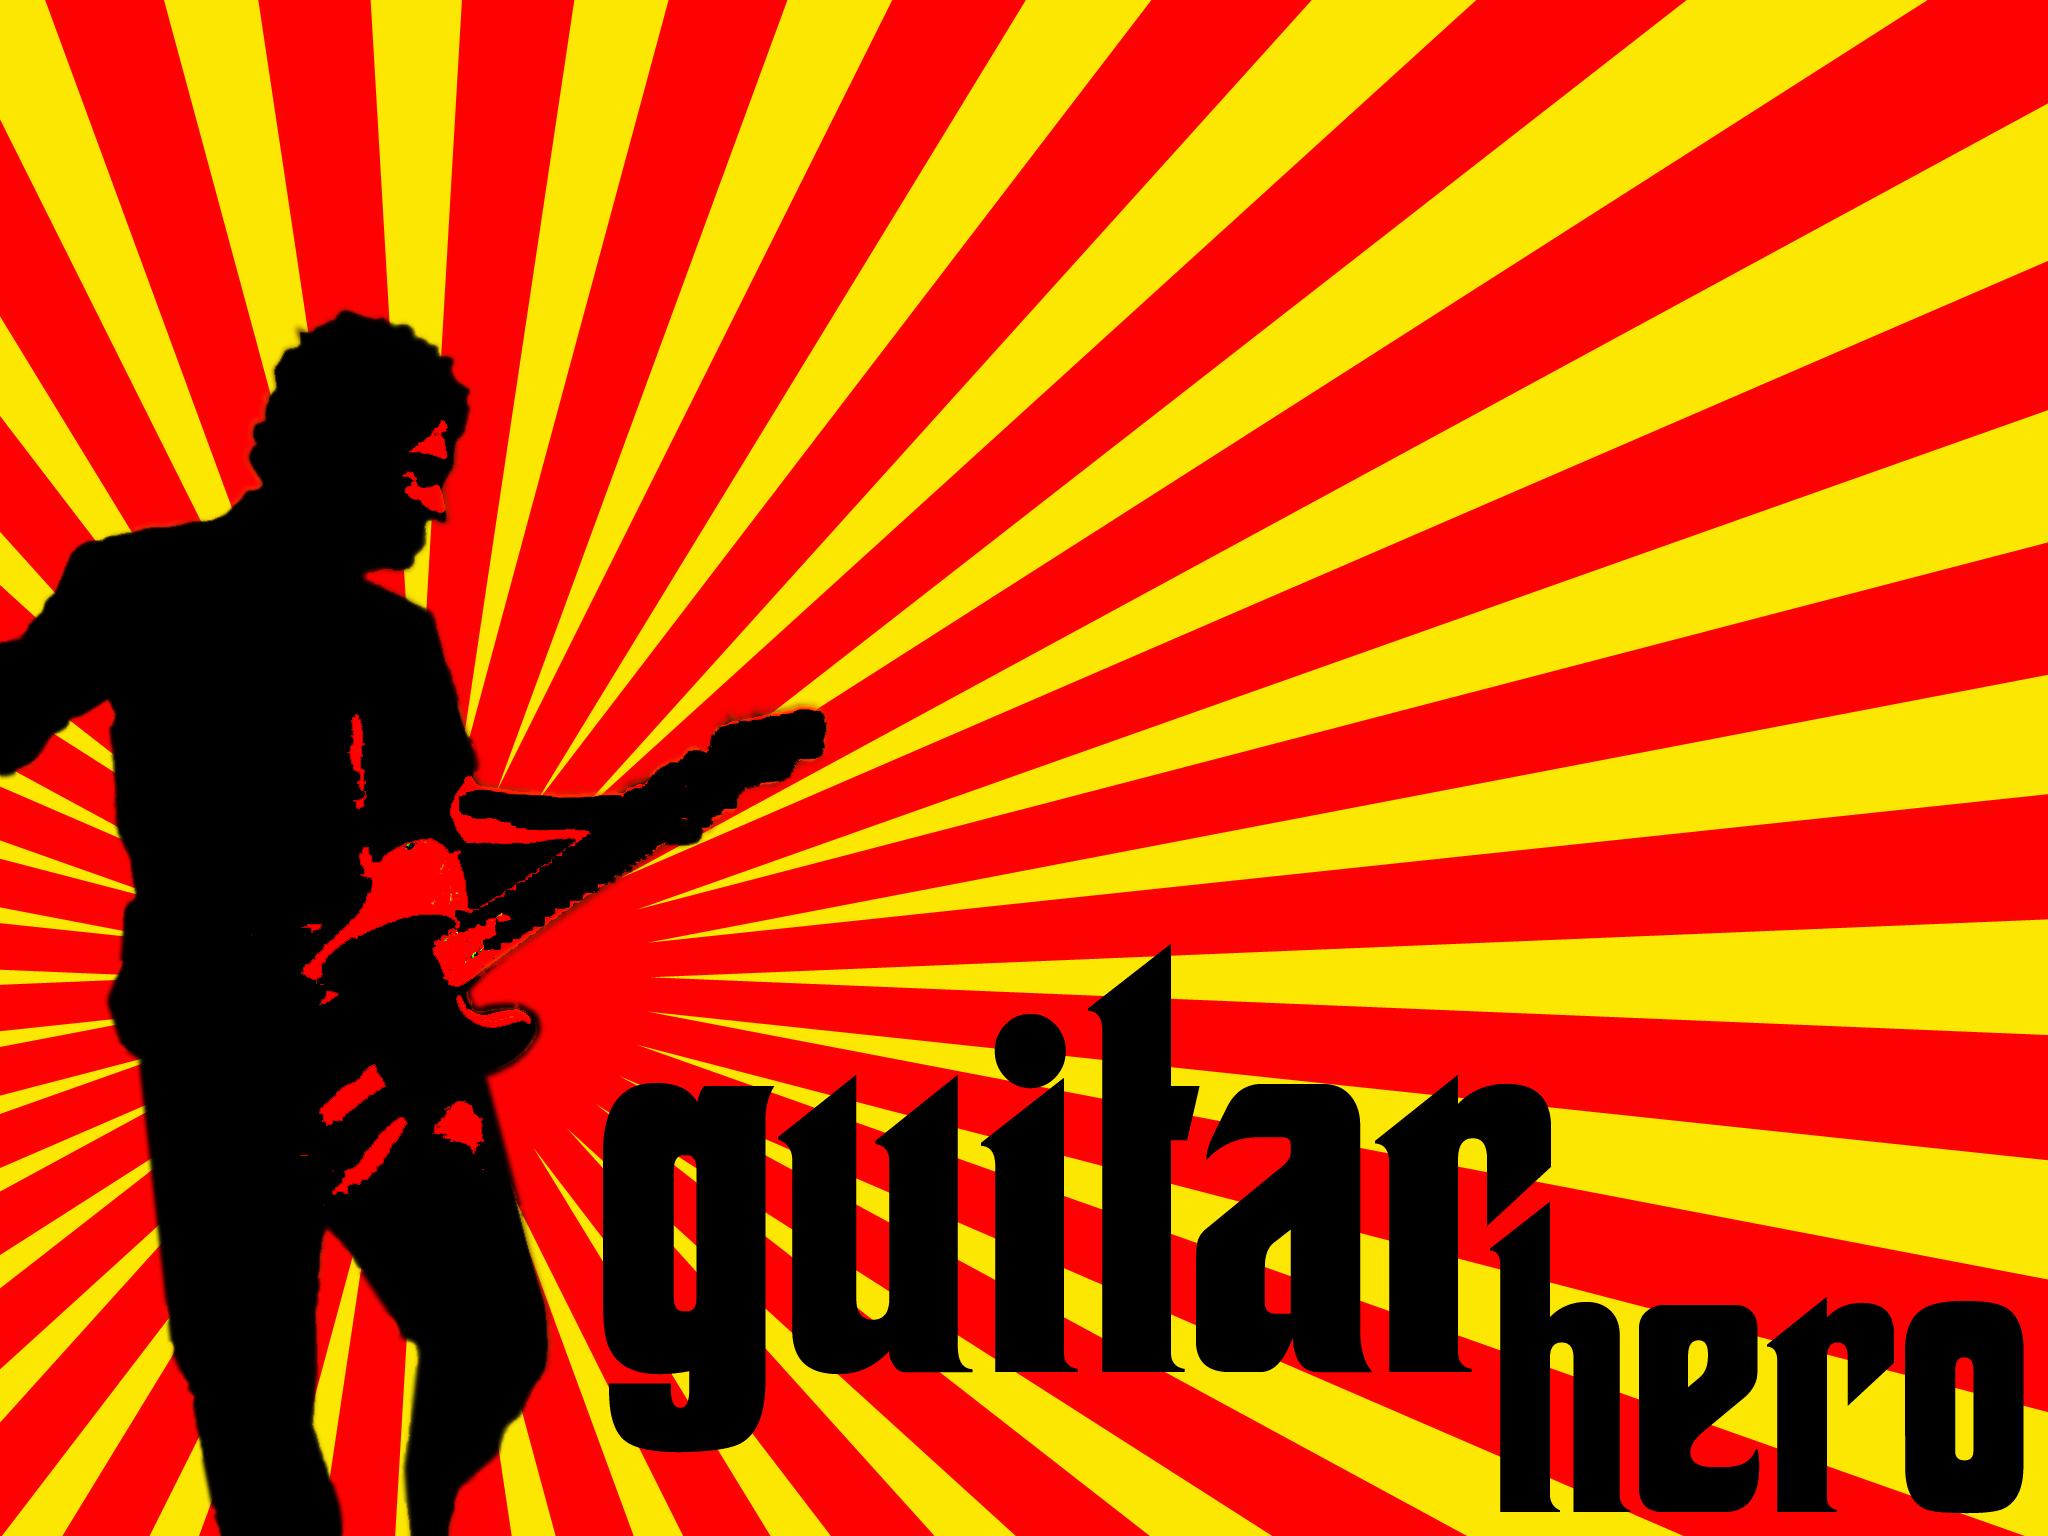 DADO guitar hero